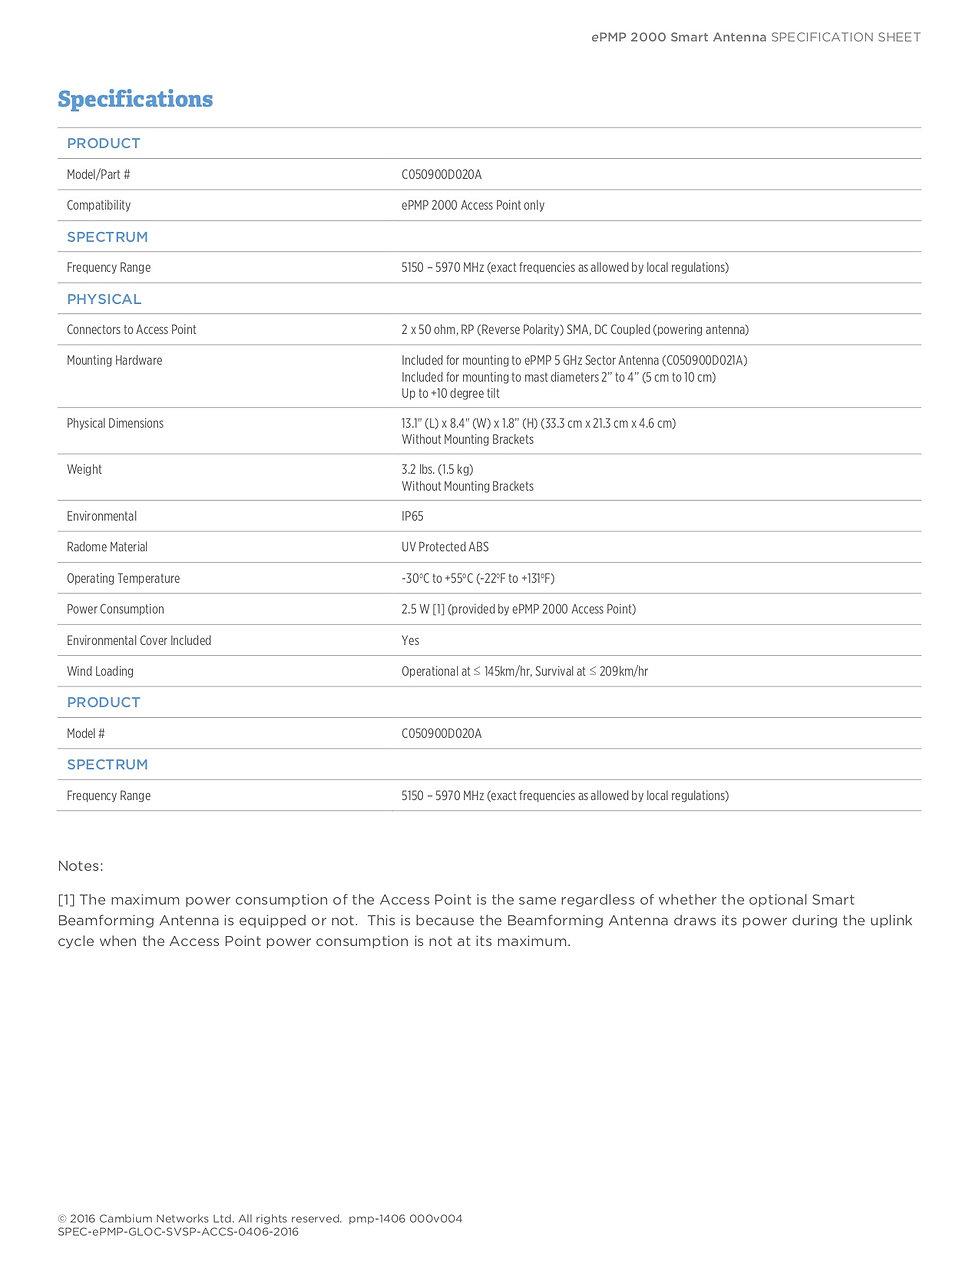 CambiumePMP 2000 Smart AntennaSpecification